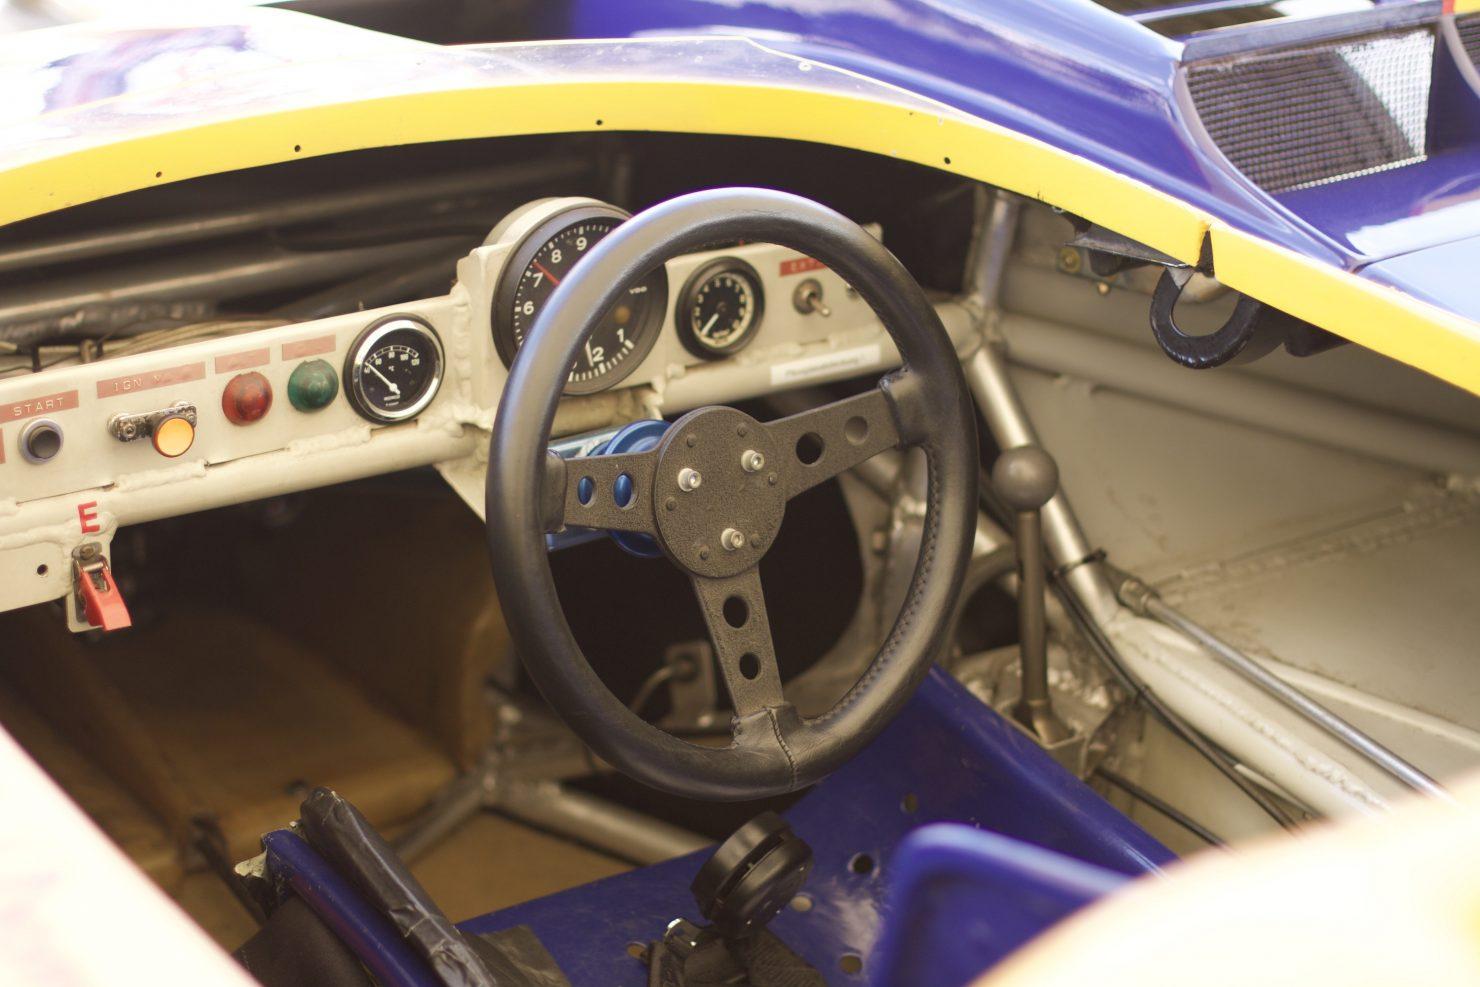 1973 Porsche 91730 1480x987 - Cockpits of Goodwood